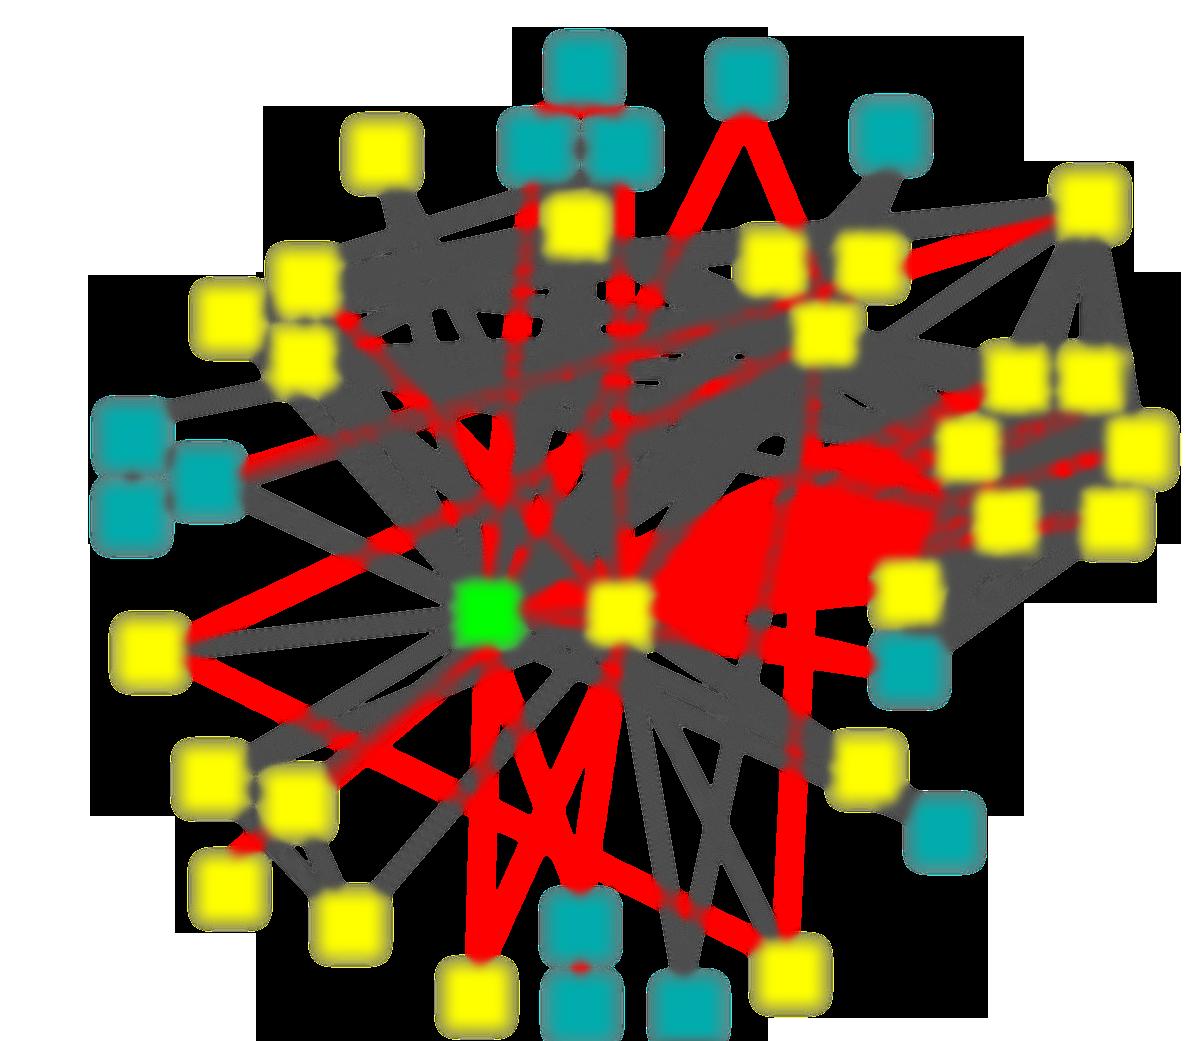 protein protein interaction